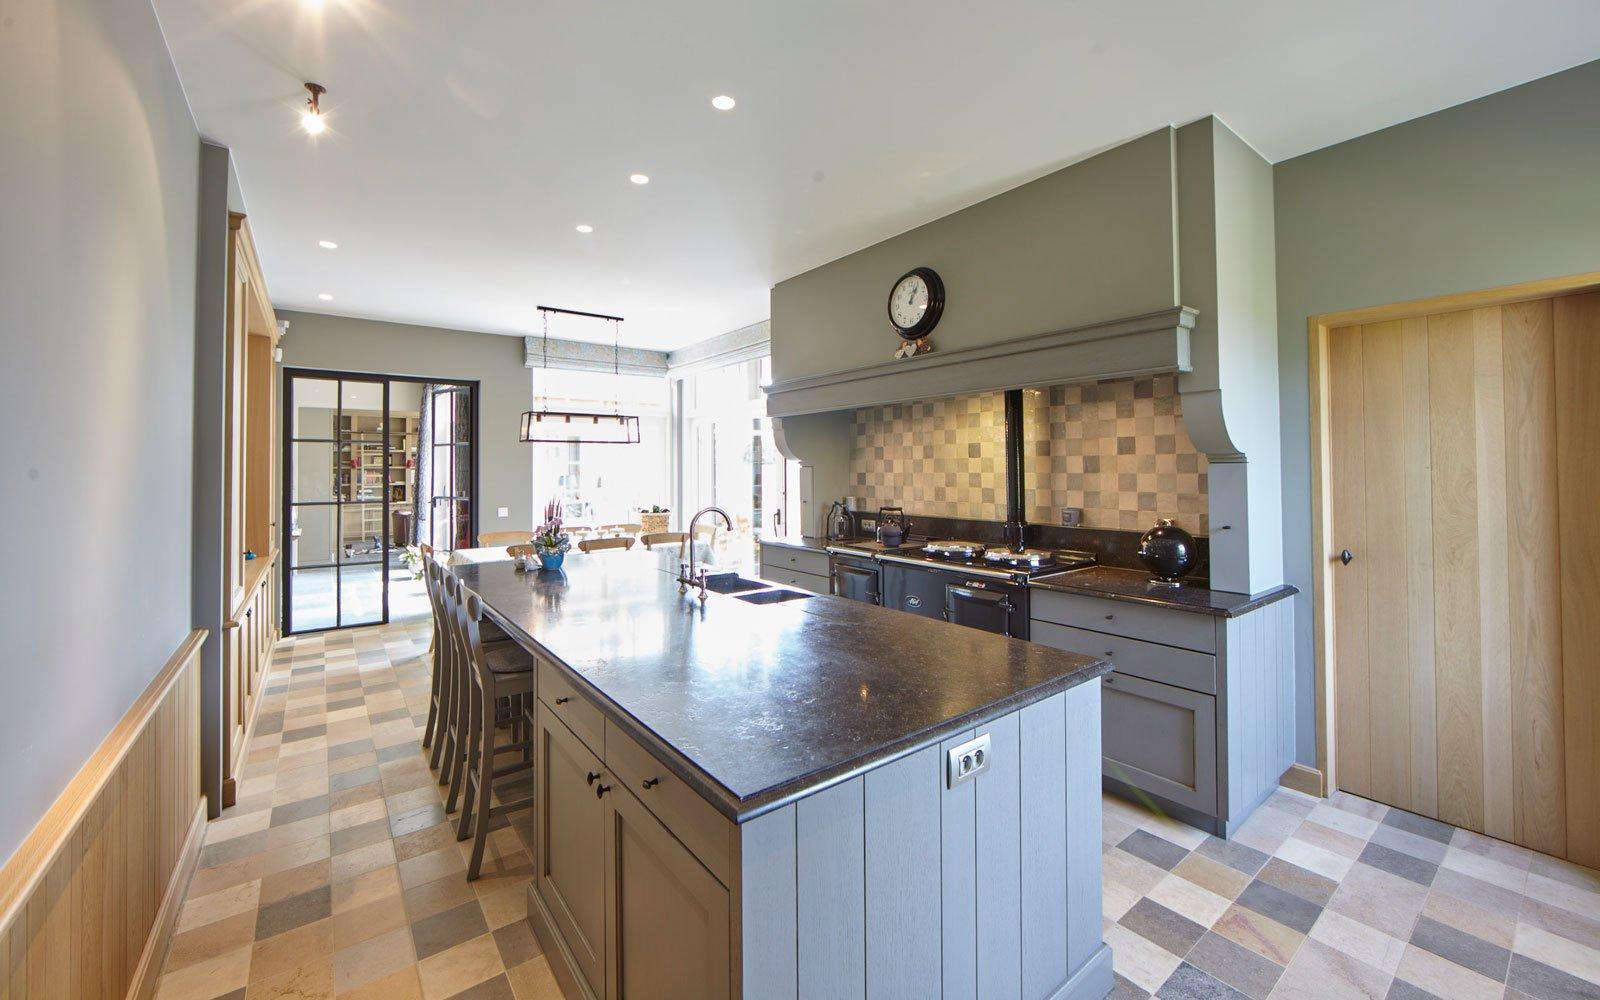 Maatwerk keuken, apparaten weggewerkt, Frank Tack Interieurbouw, Engelse cottage, Bart François